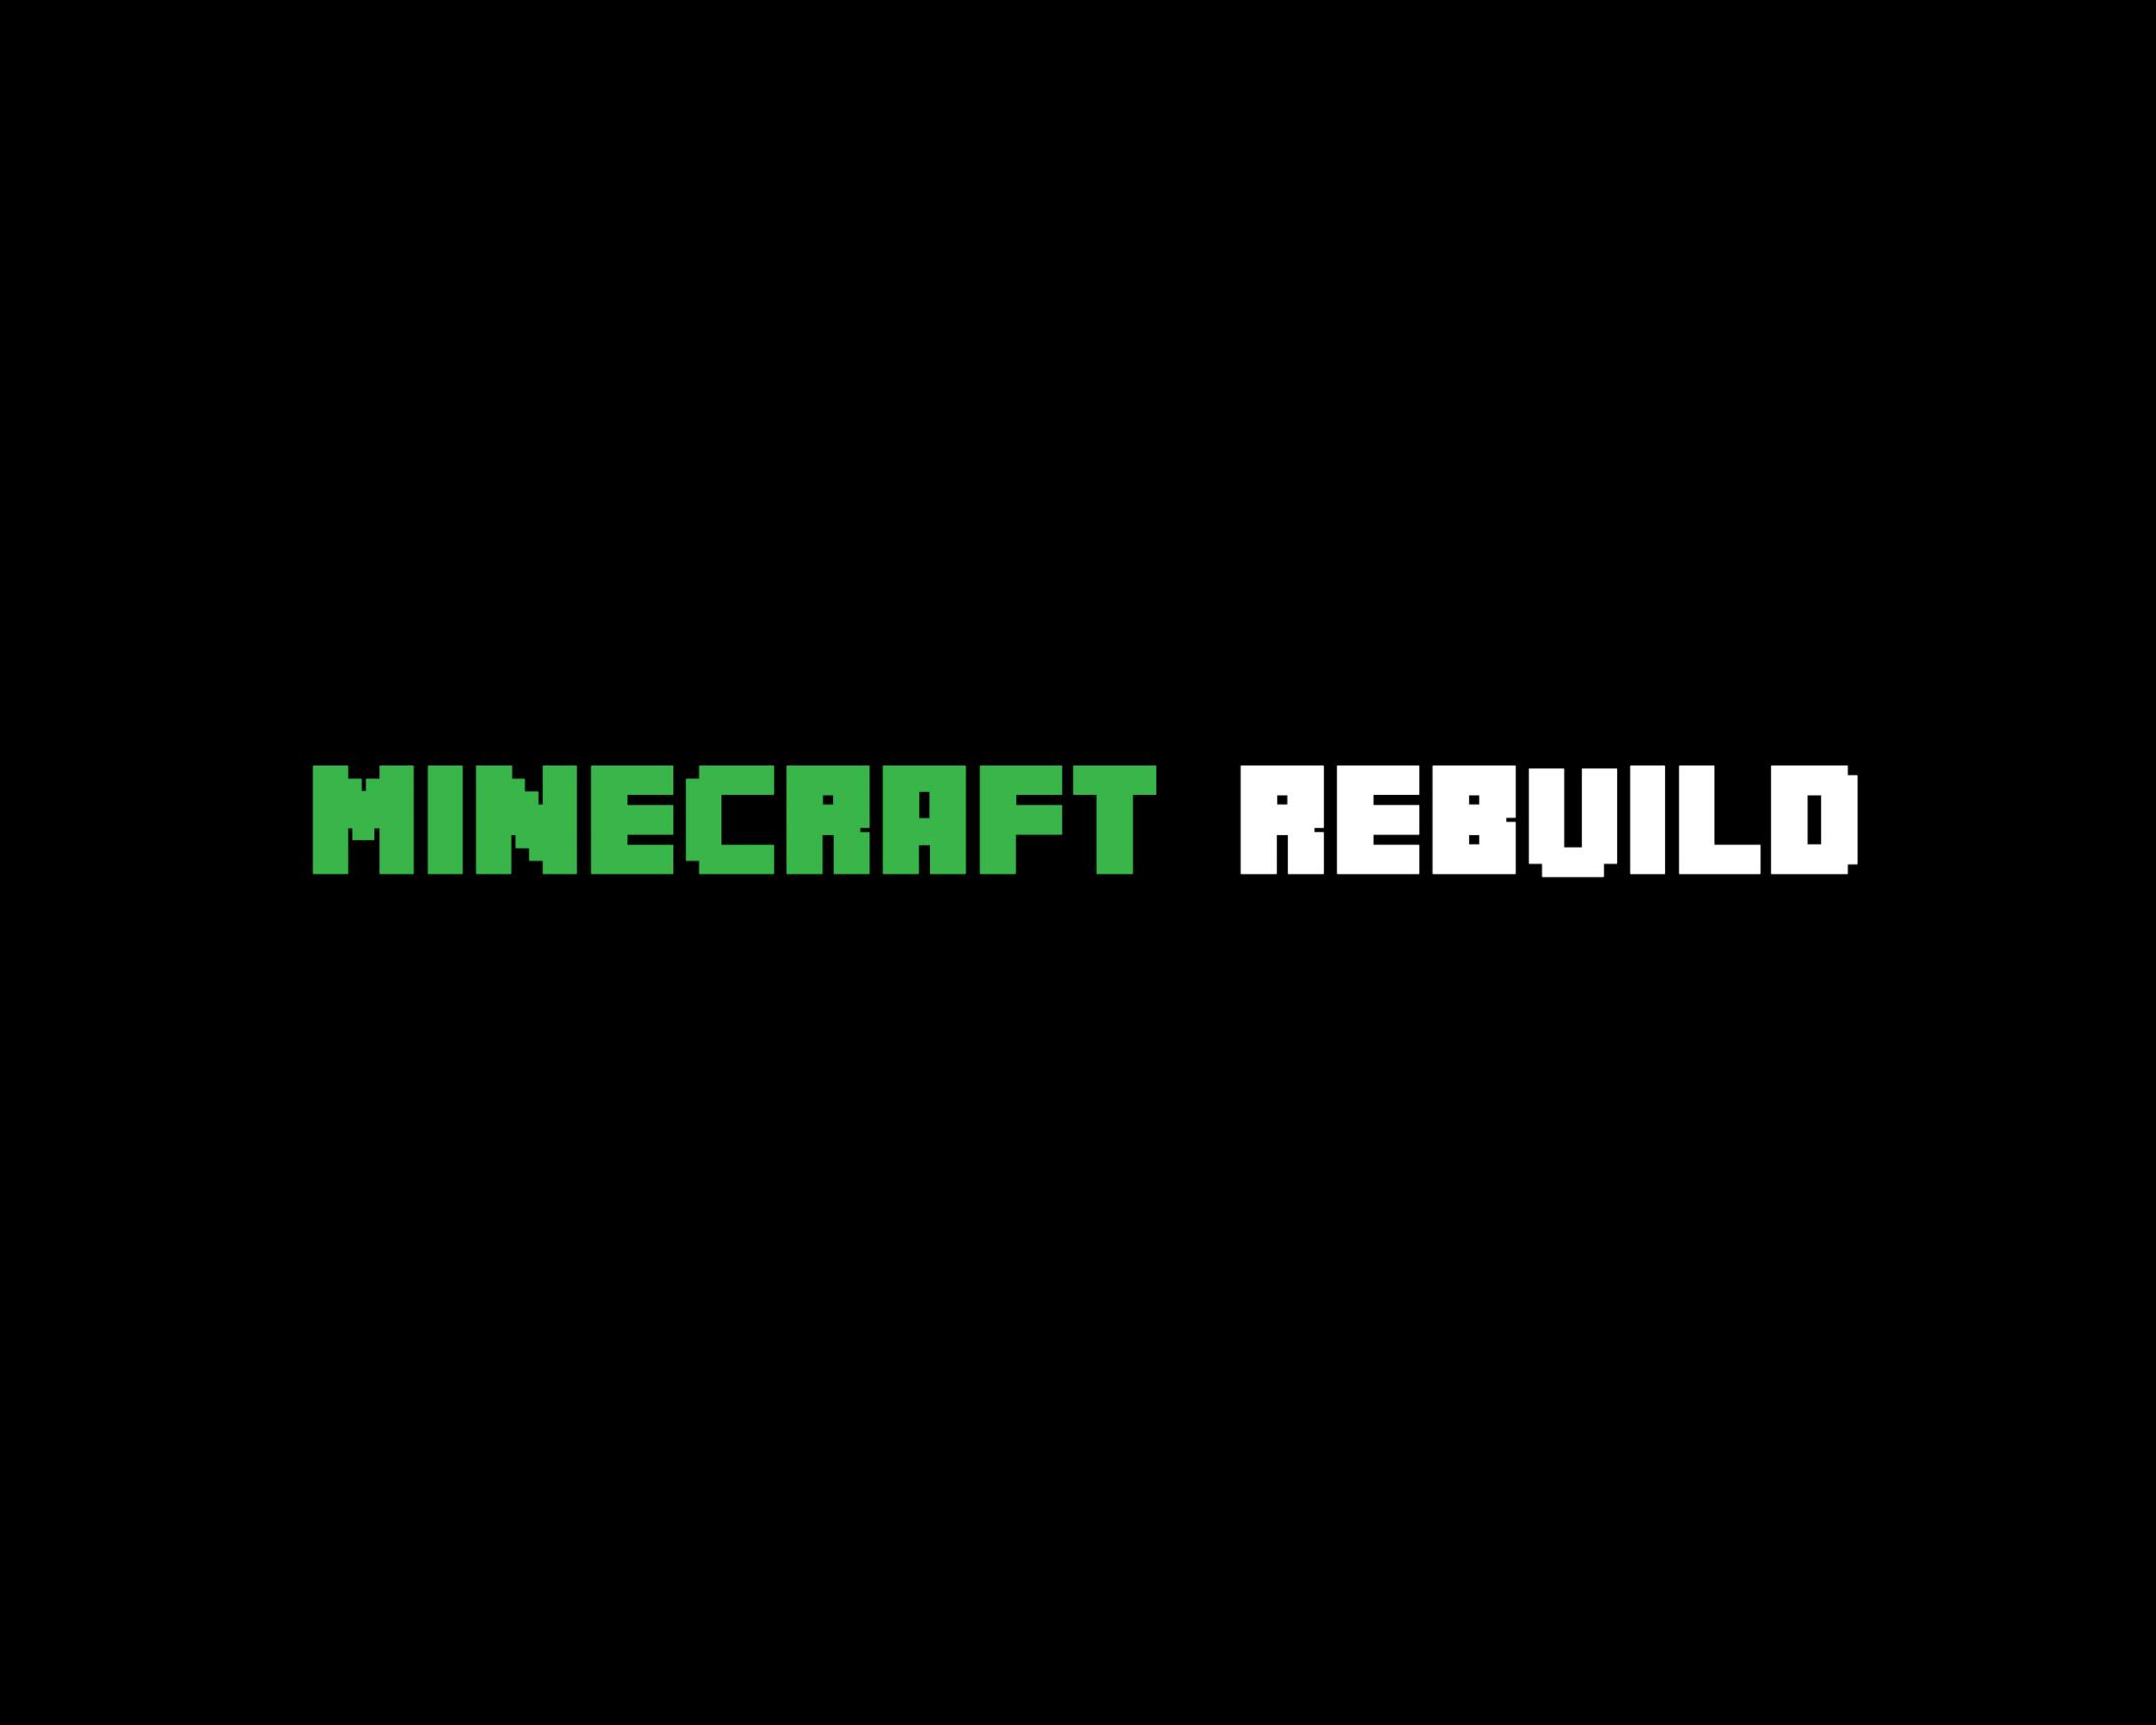 Thumbnail for Minecraft Rebuild